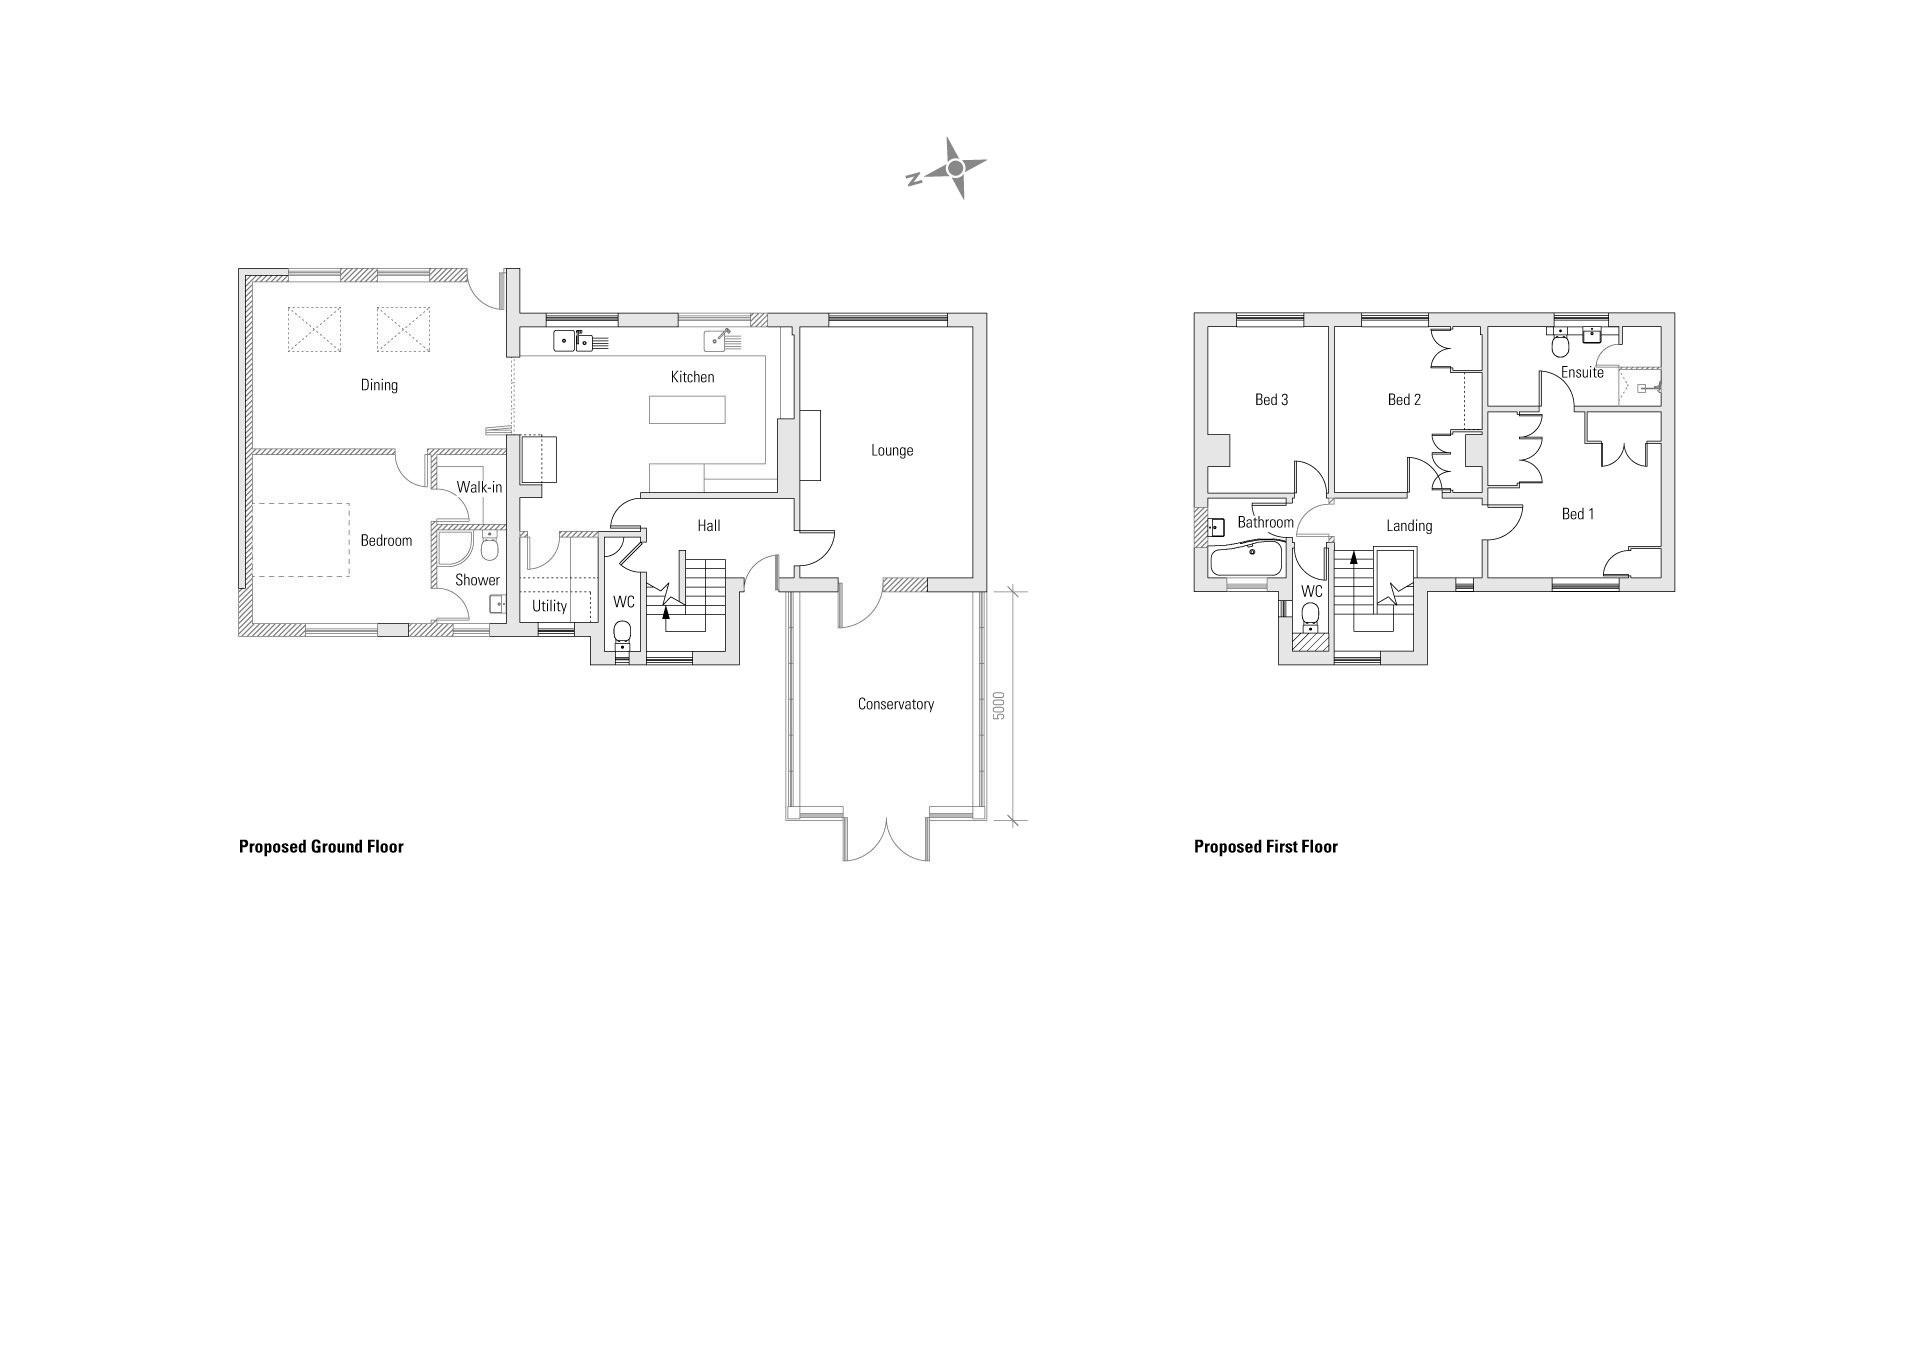 16 139 03B Proposed Plans.jpg